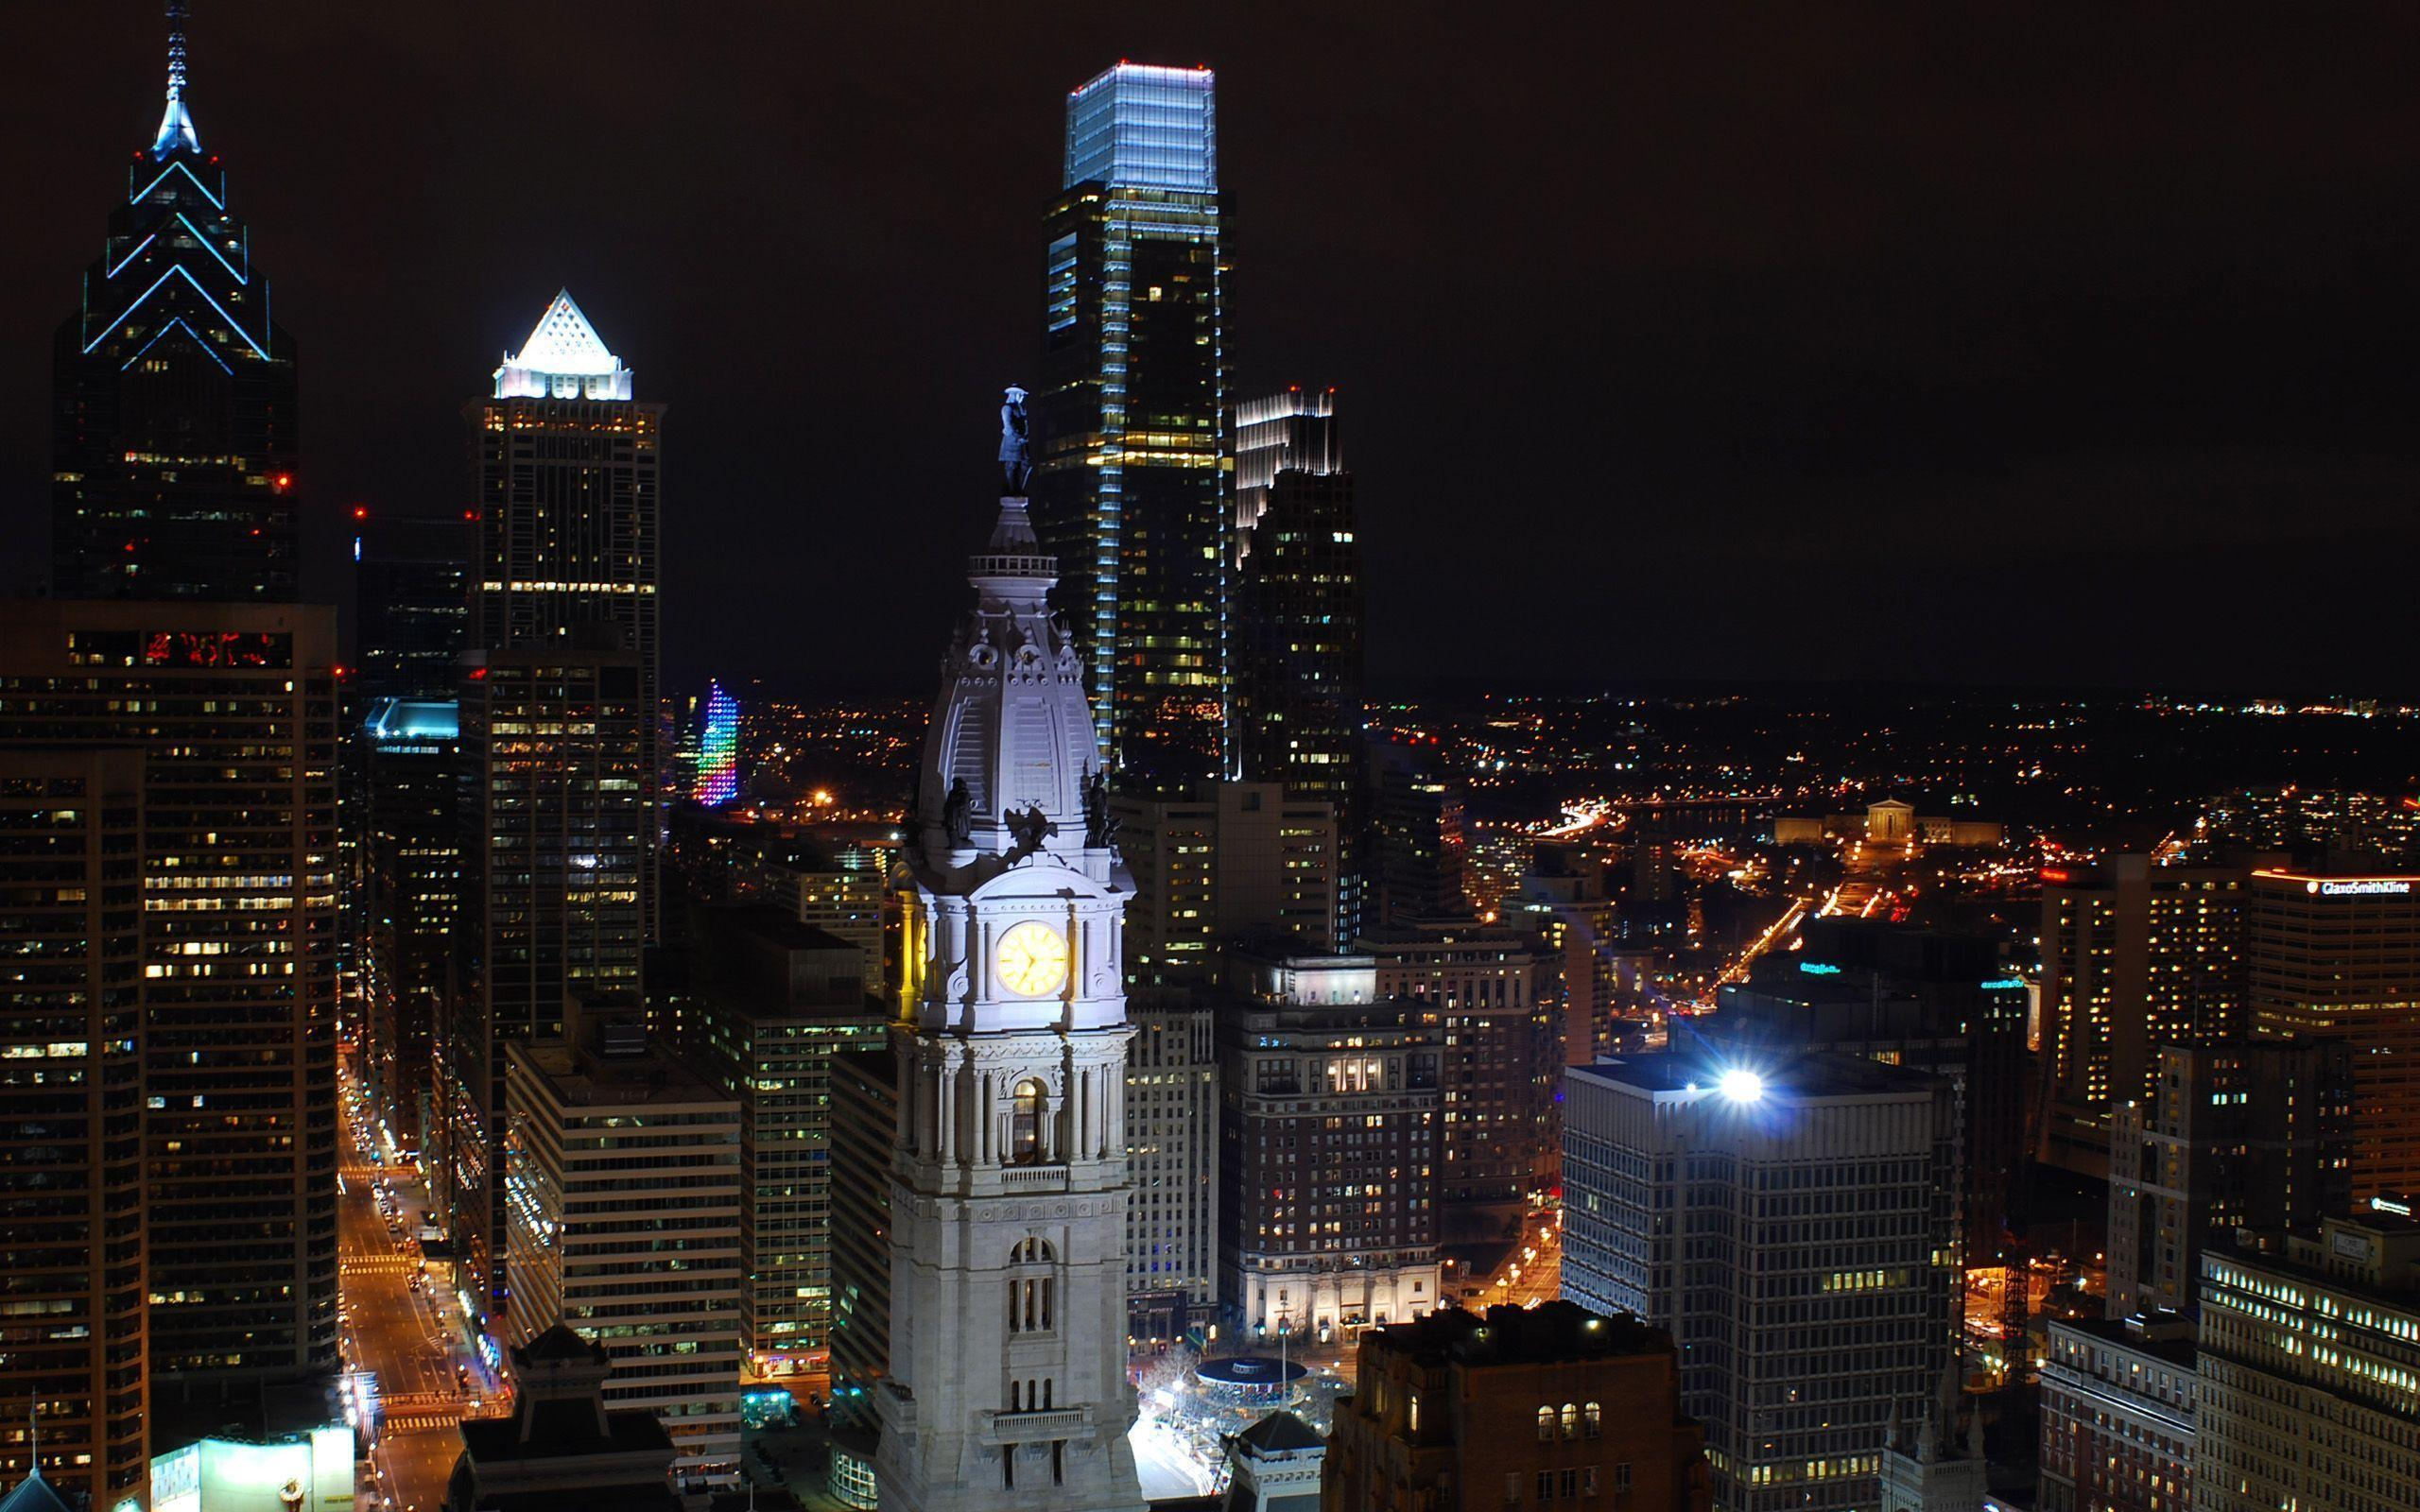 Download Philadelphia Skyline At Night Wallpaper Hd